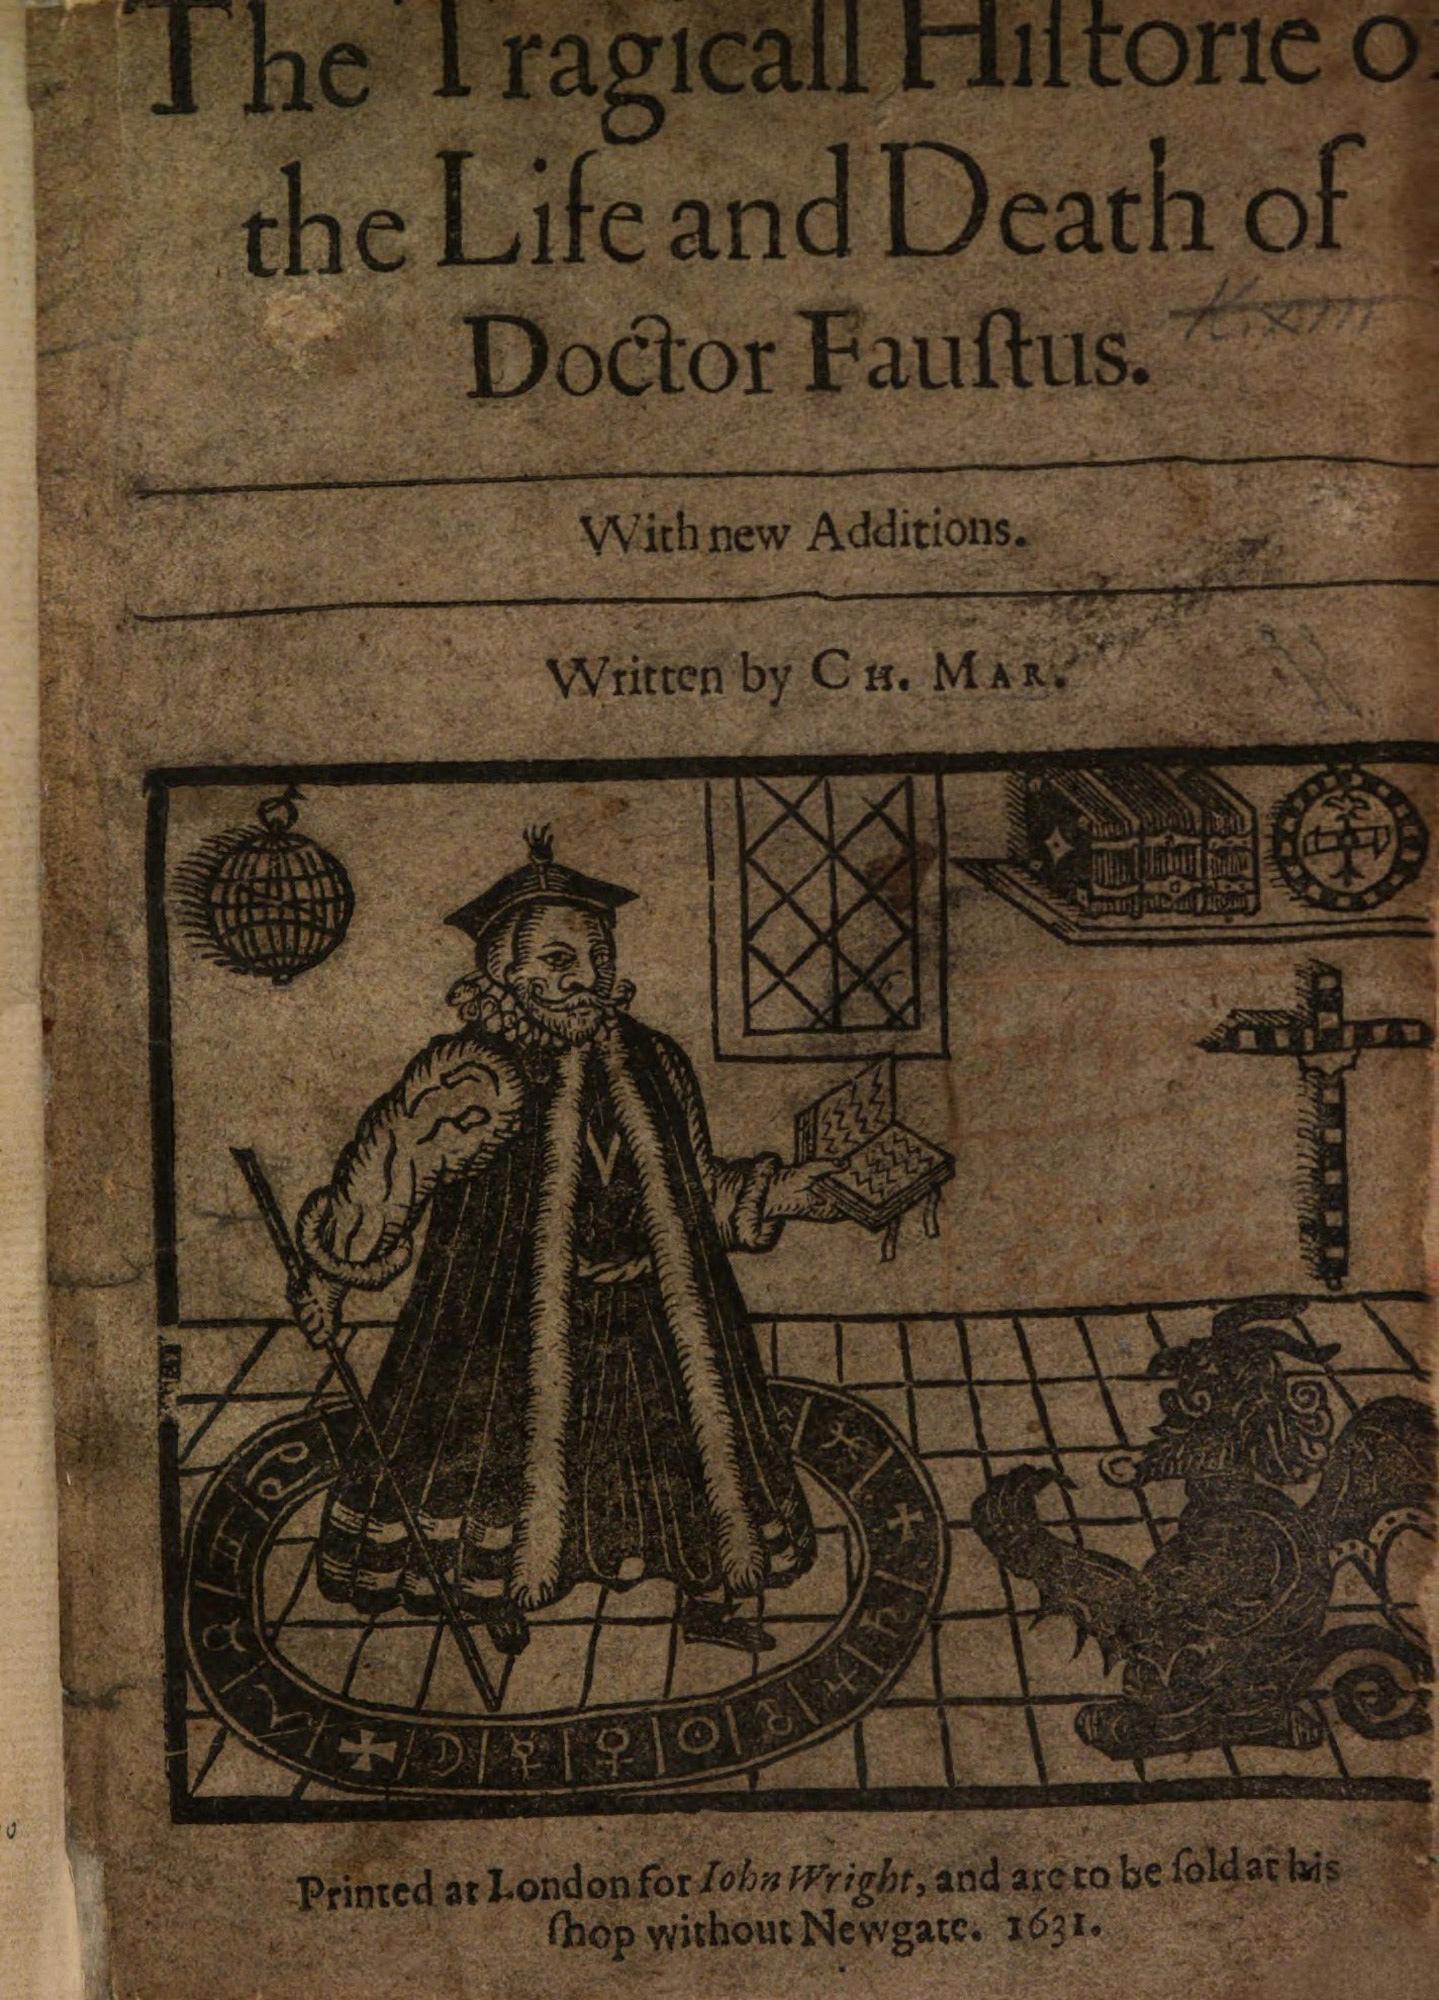 Marlowe's Doctor Faustus, 1631